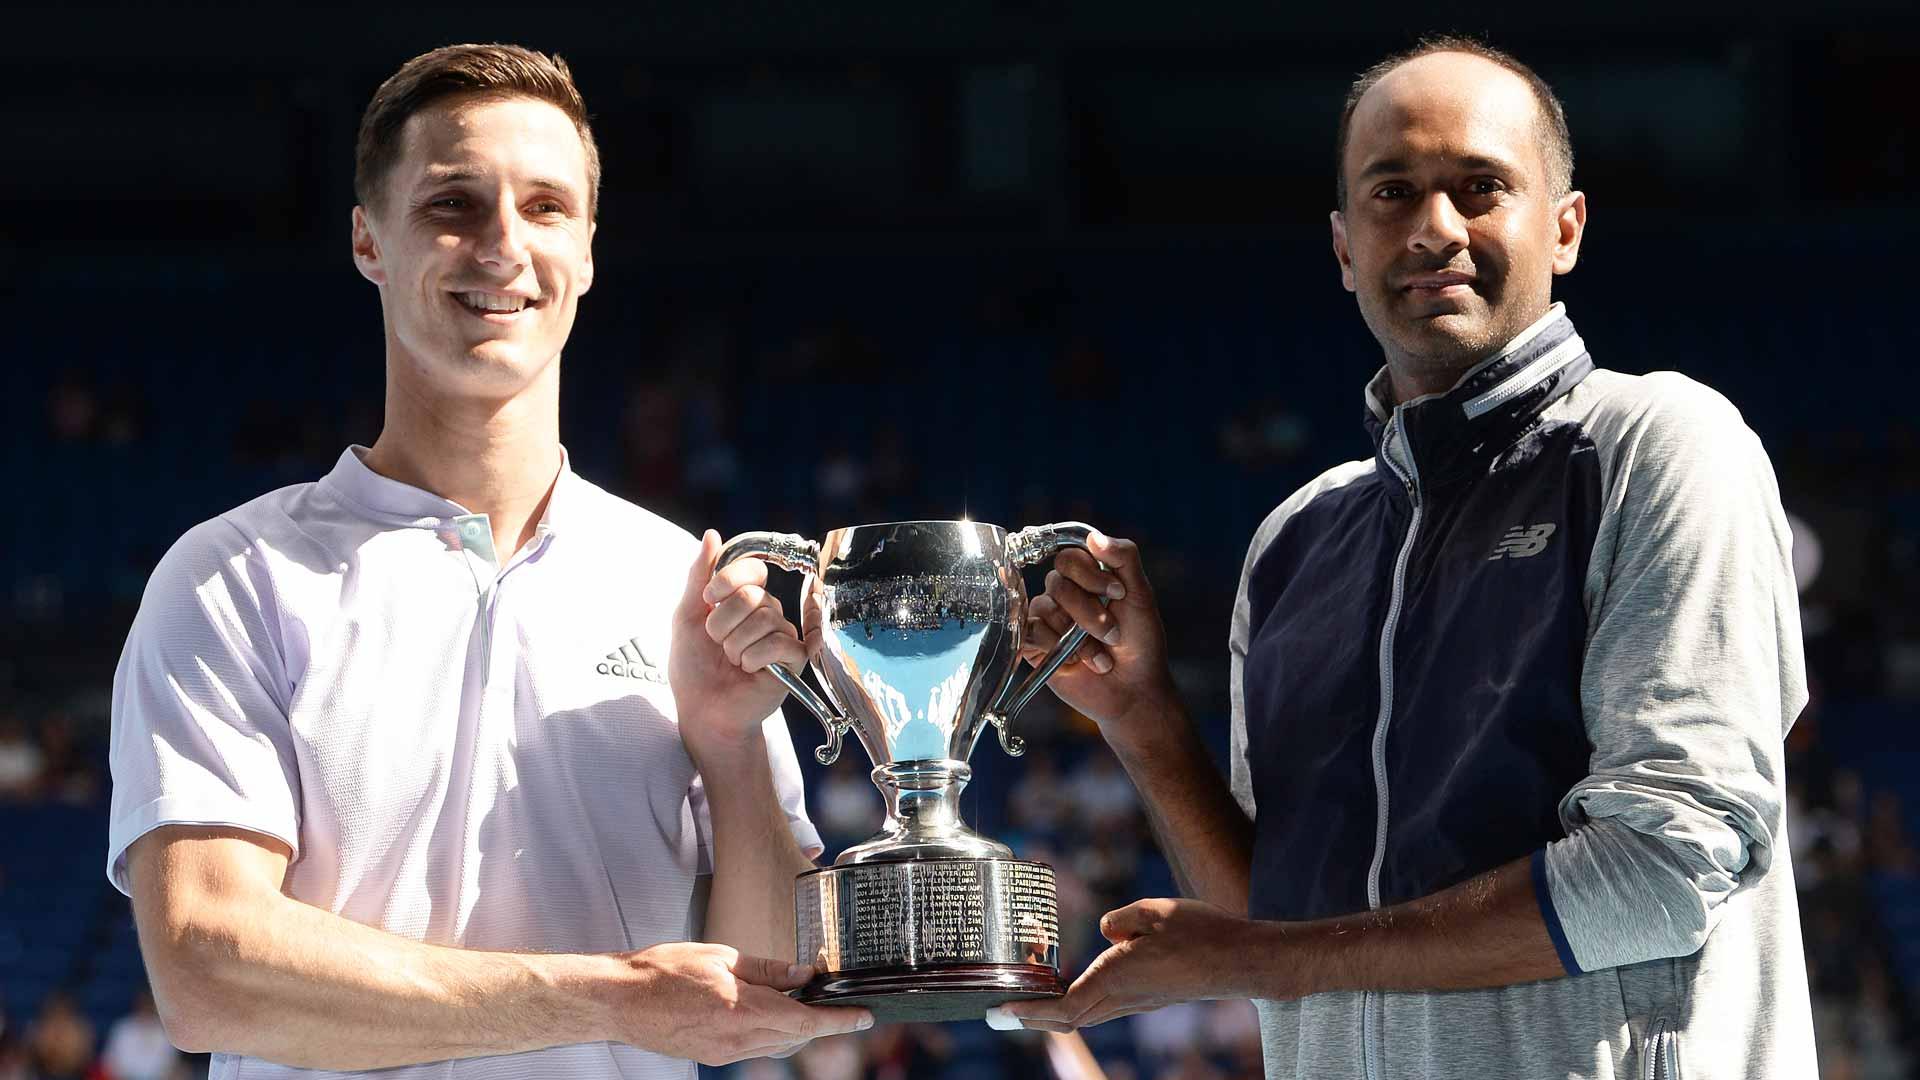 Joe Salisbury/Rajeev Ram trophy